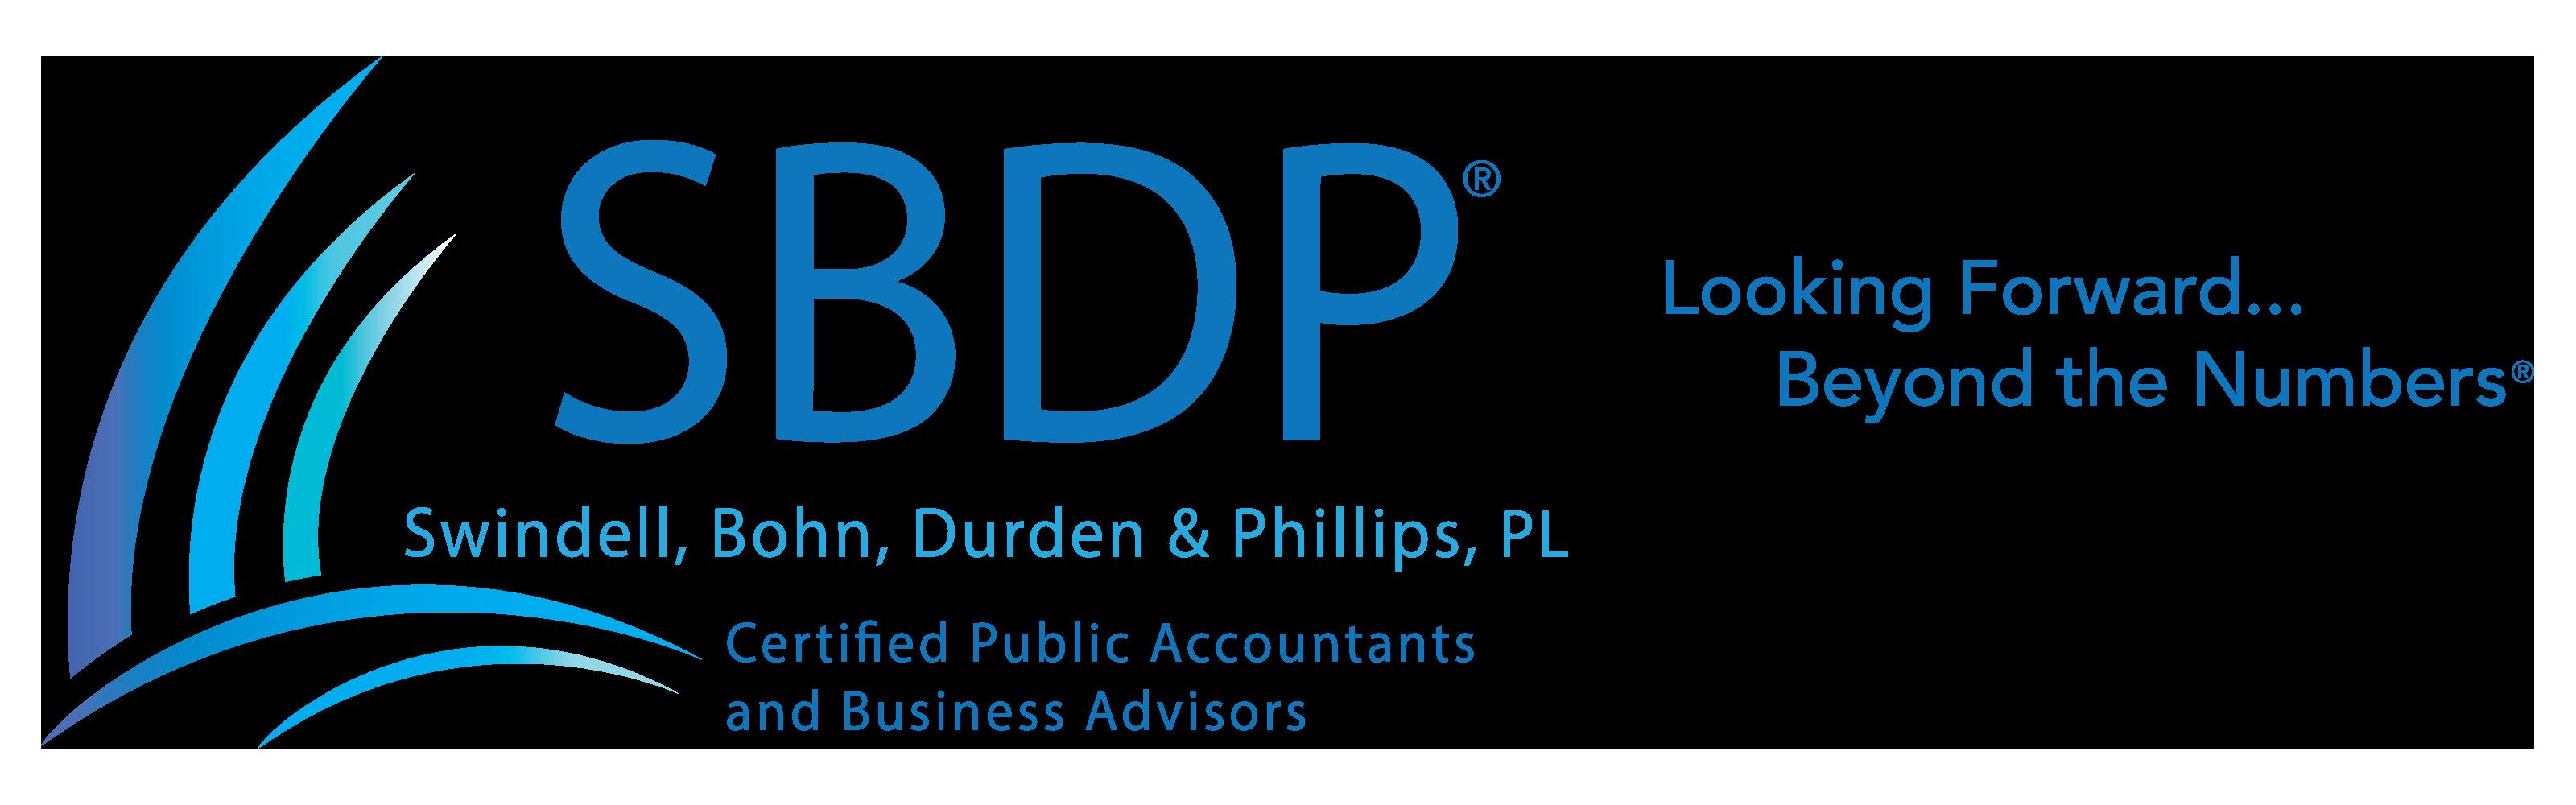 SBDP-Tagline-Logo